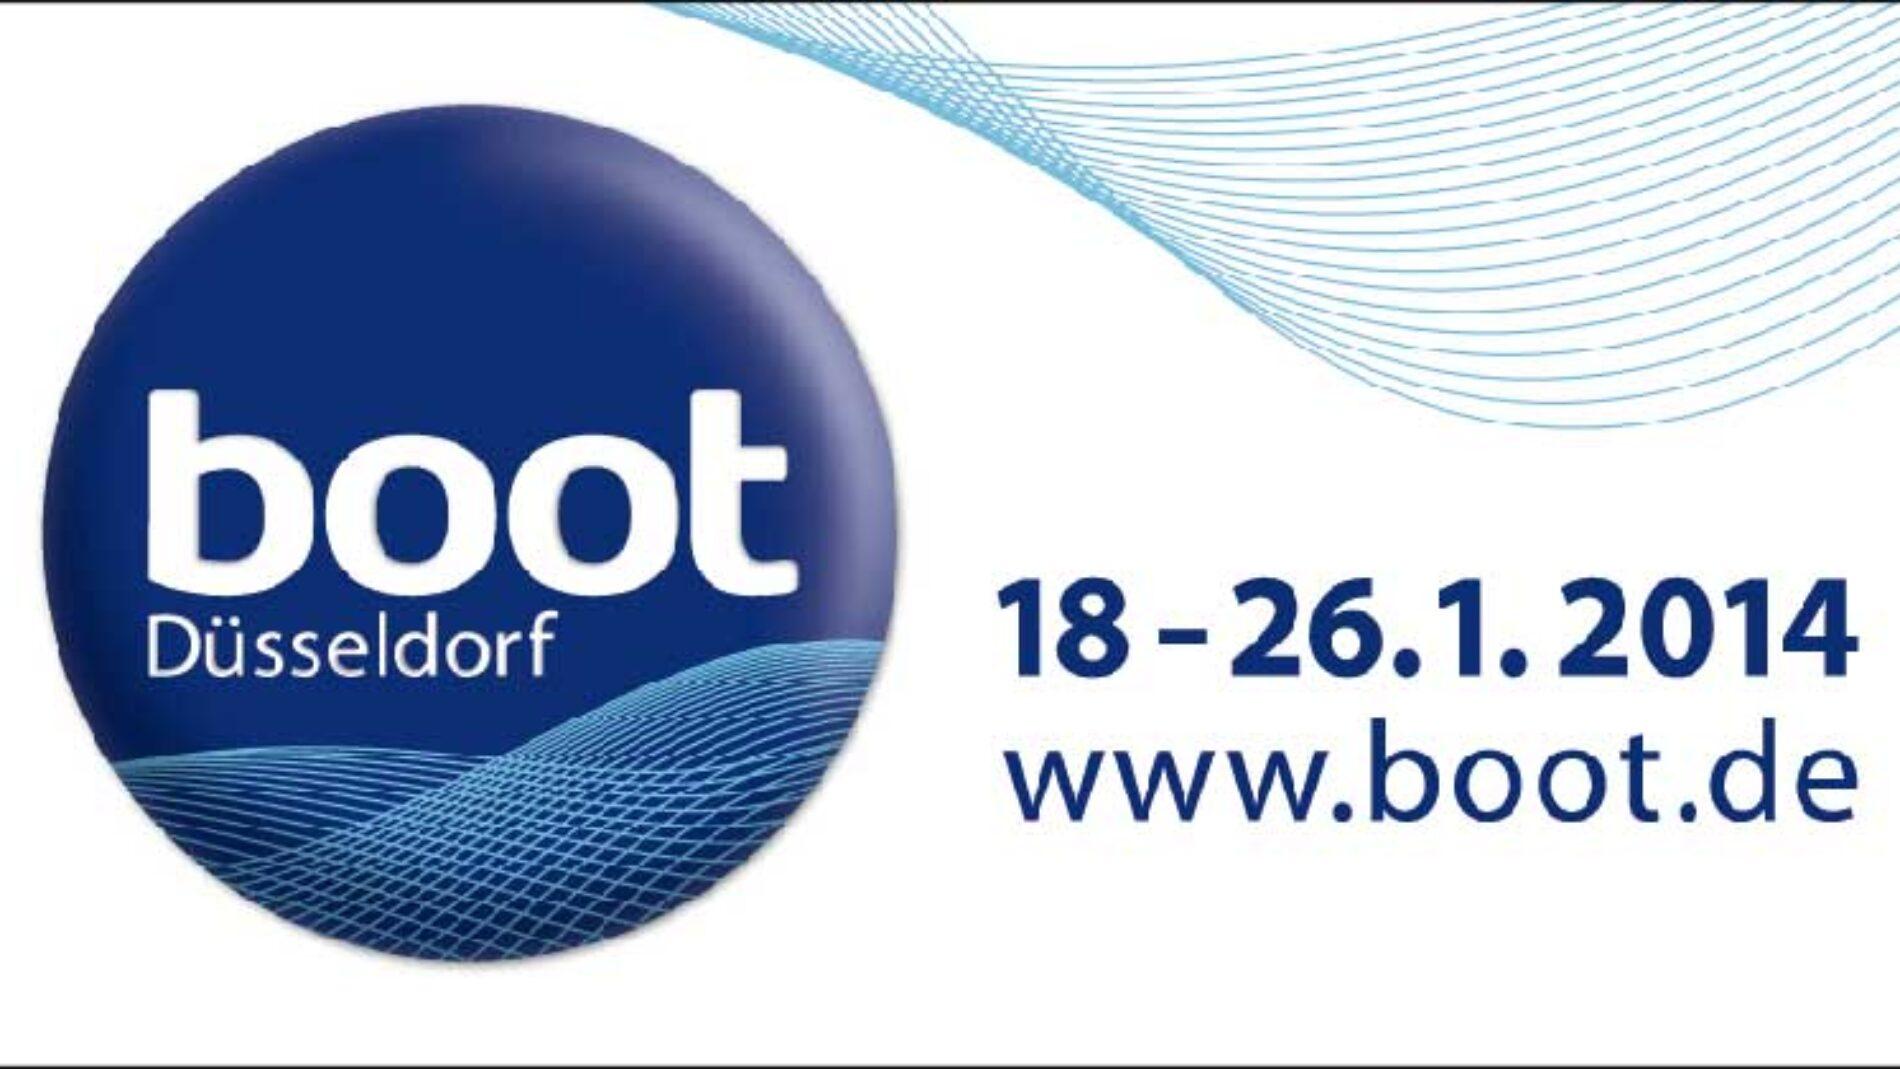 boot-dusseldorf-boat-show-01